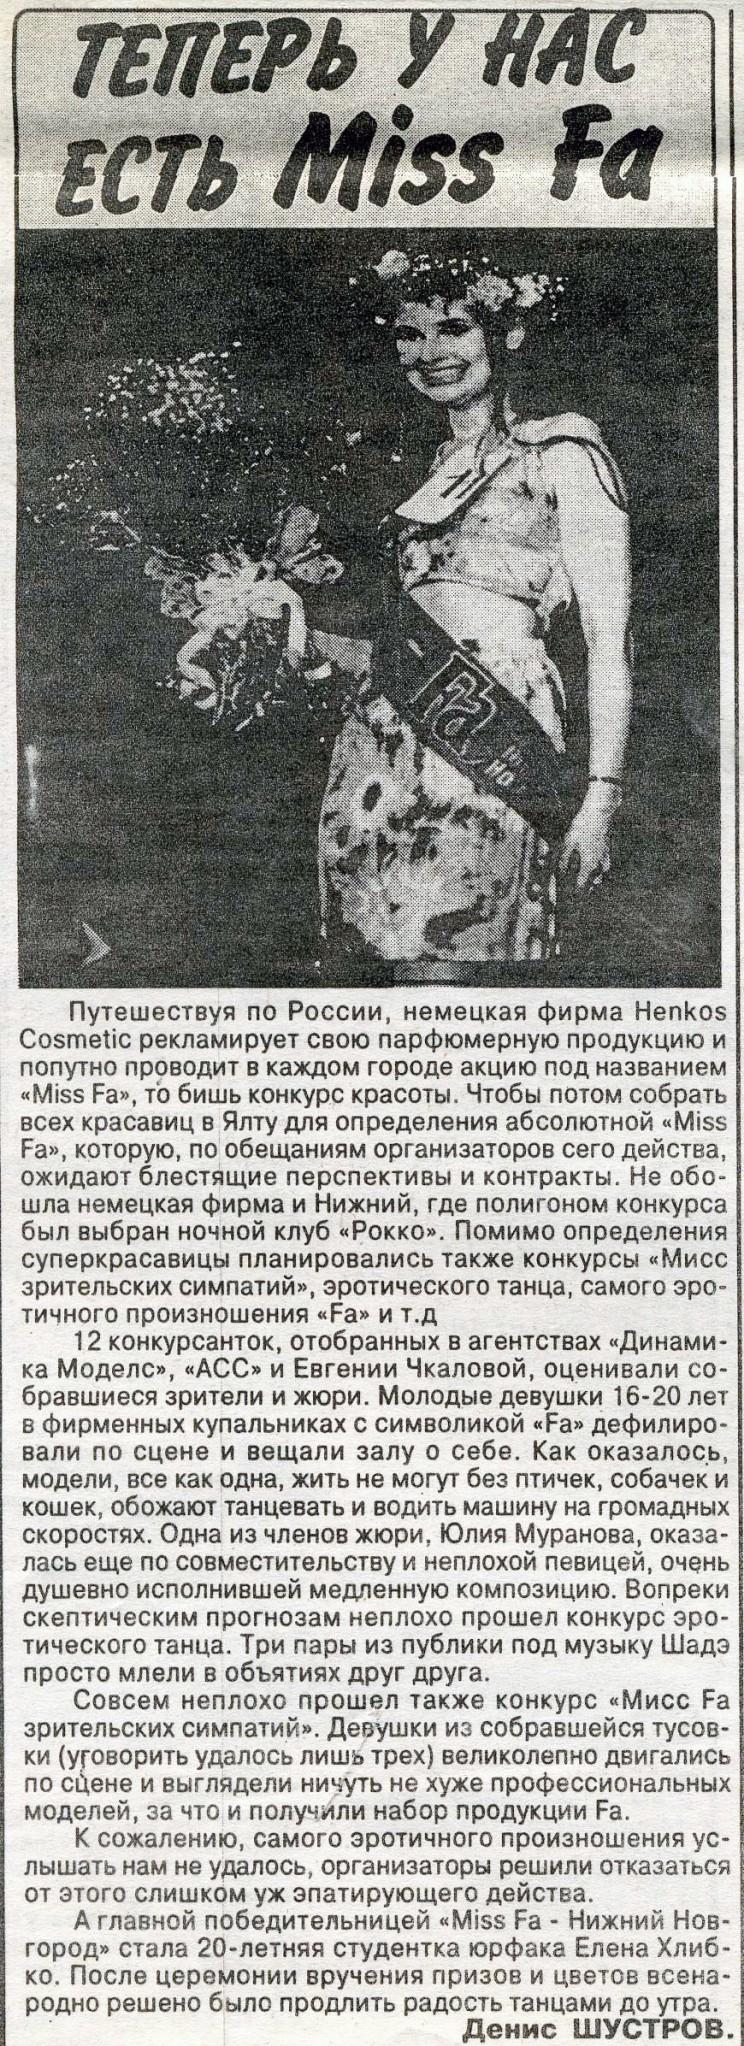 Мисс Fa Елена Хлибко, Московский комсомолец